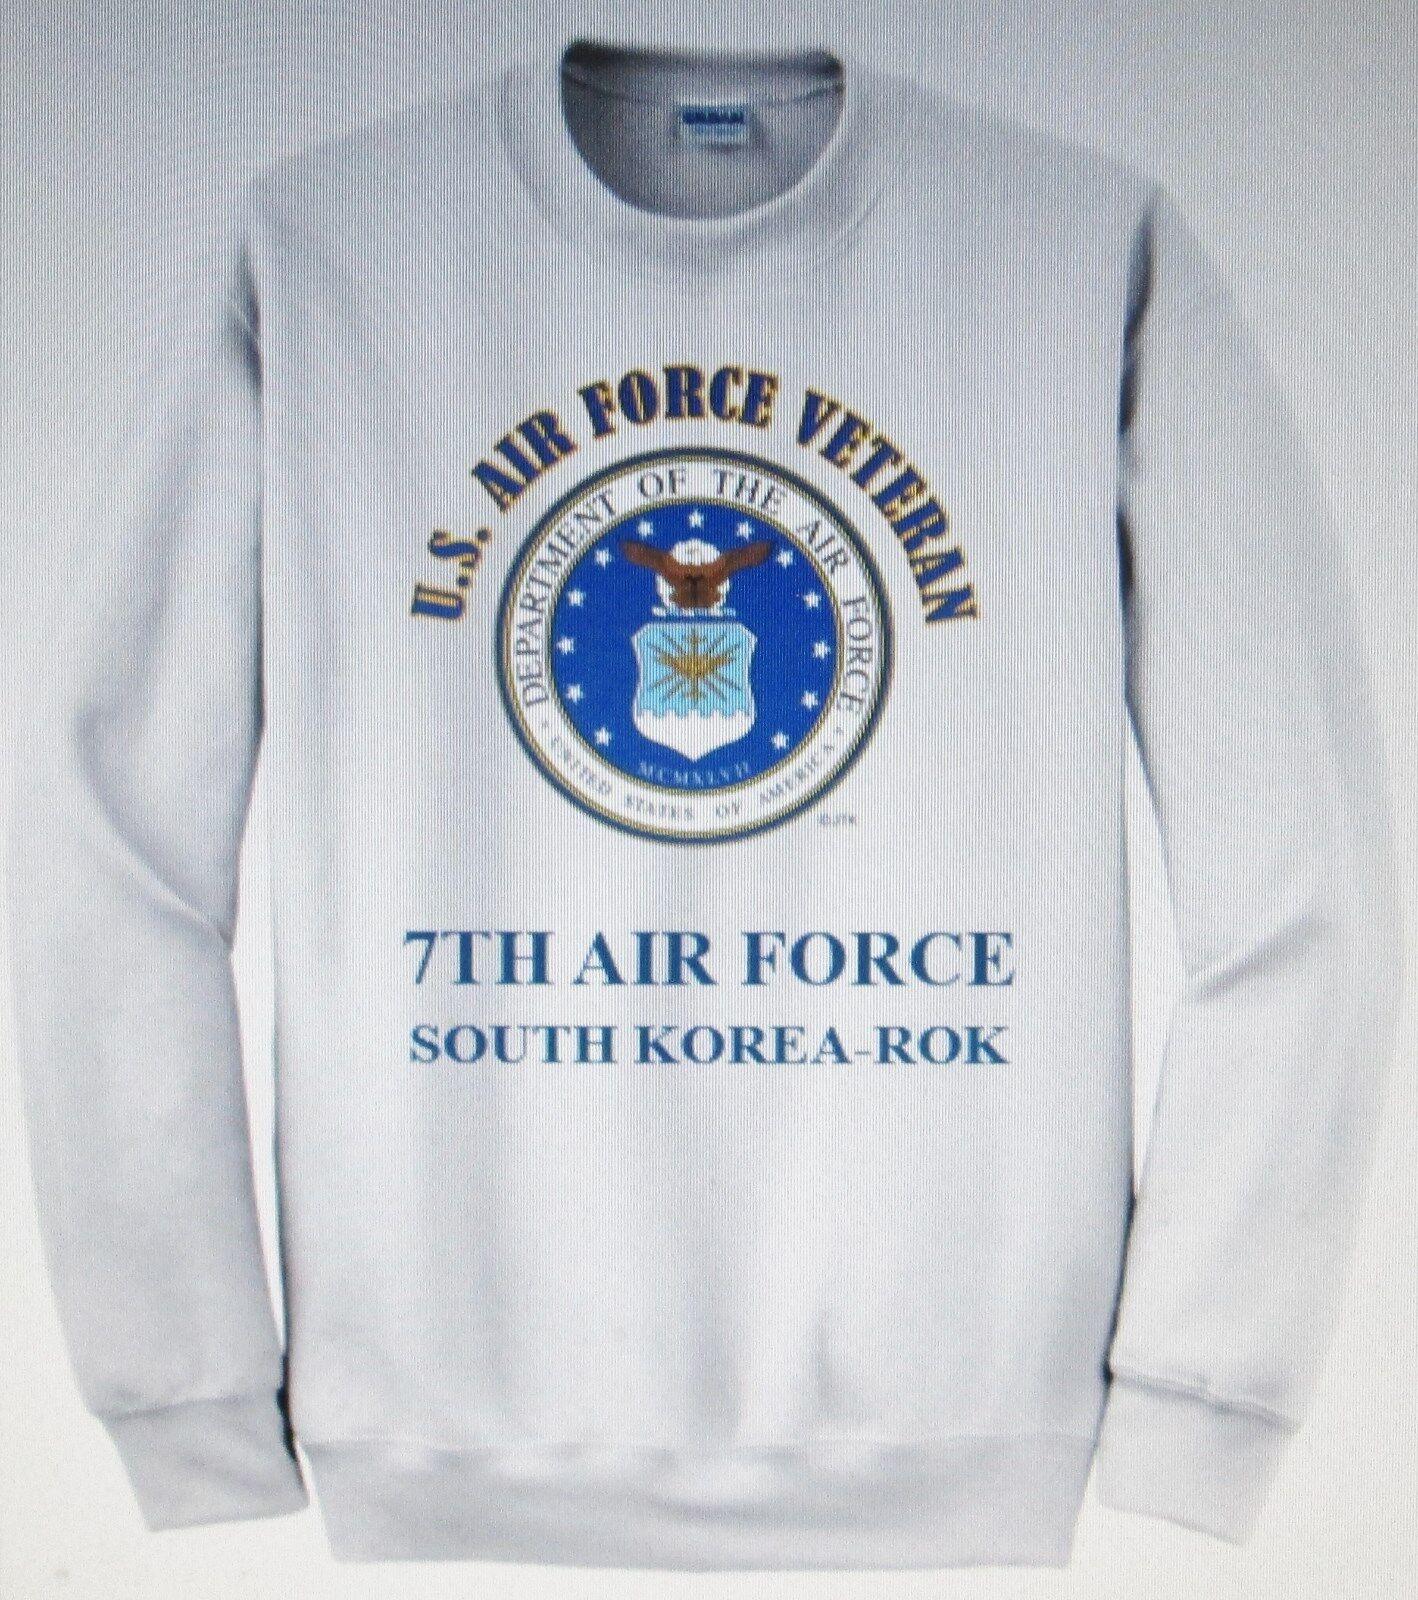 7TH AIR FORCE SOUTH KOREA-ROK U.S. AIR FORCE EMBLEM SWEATSHIRT